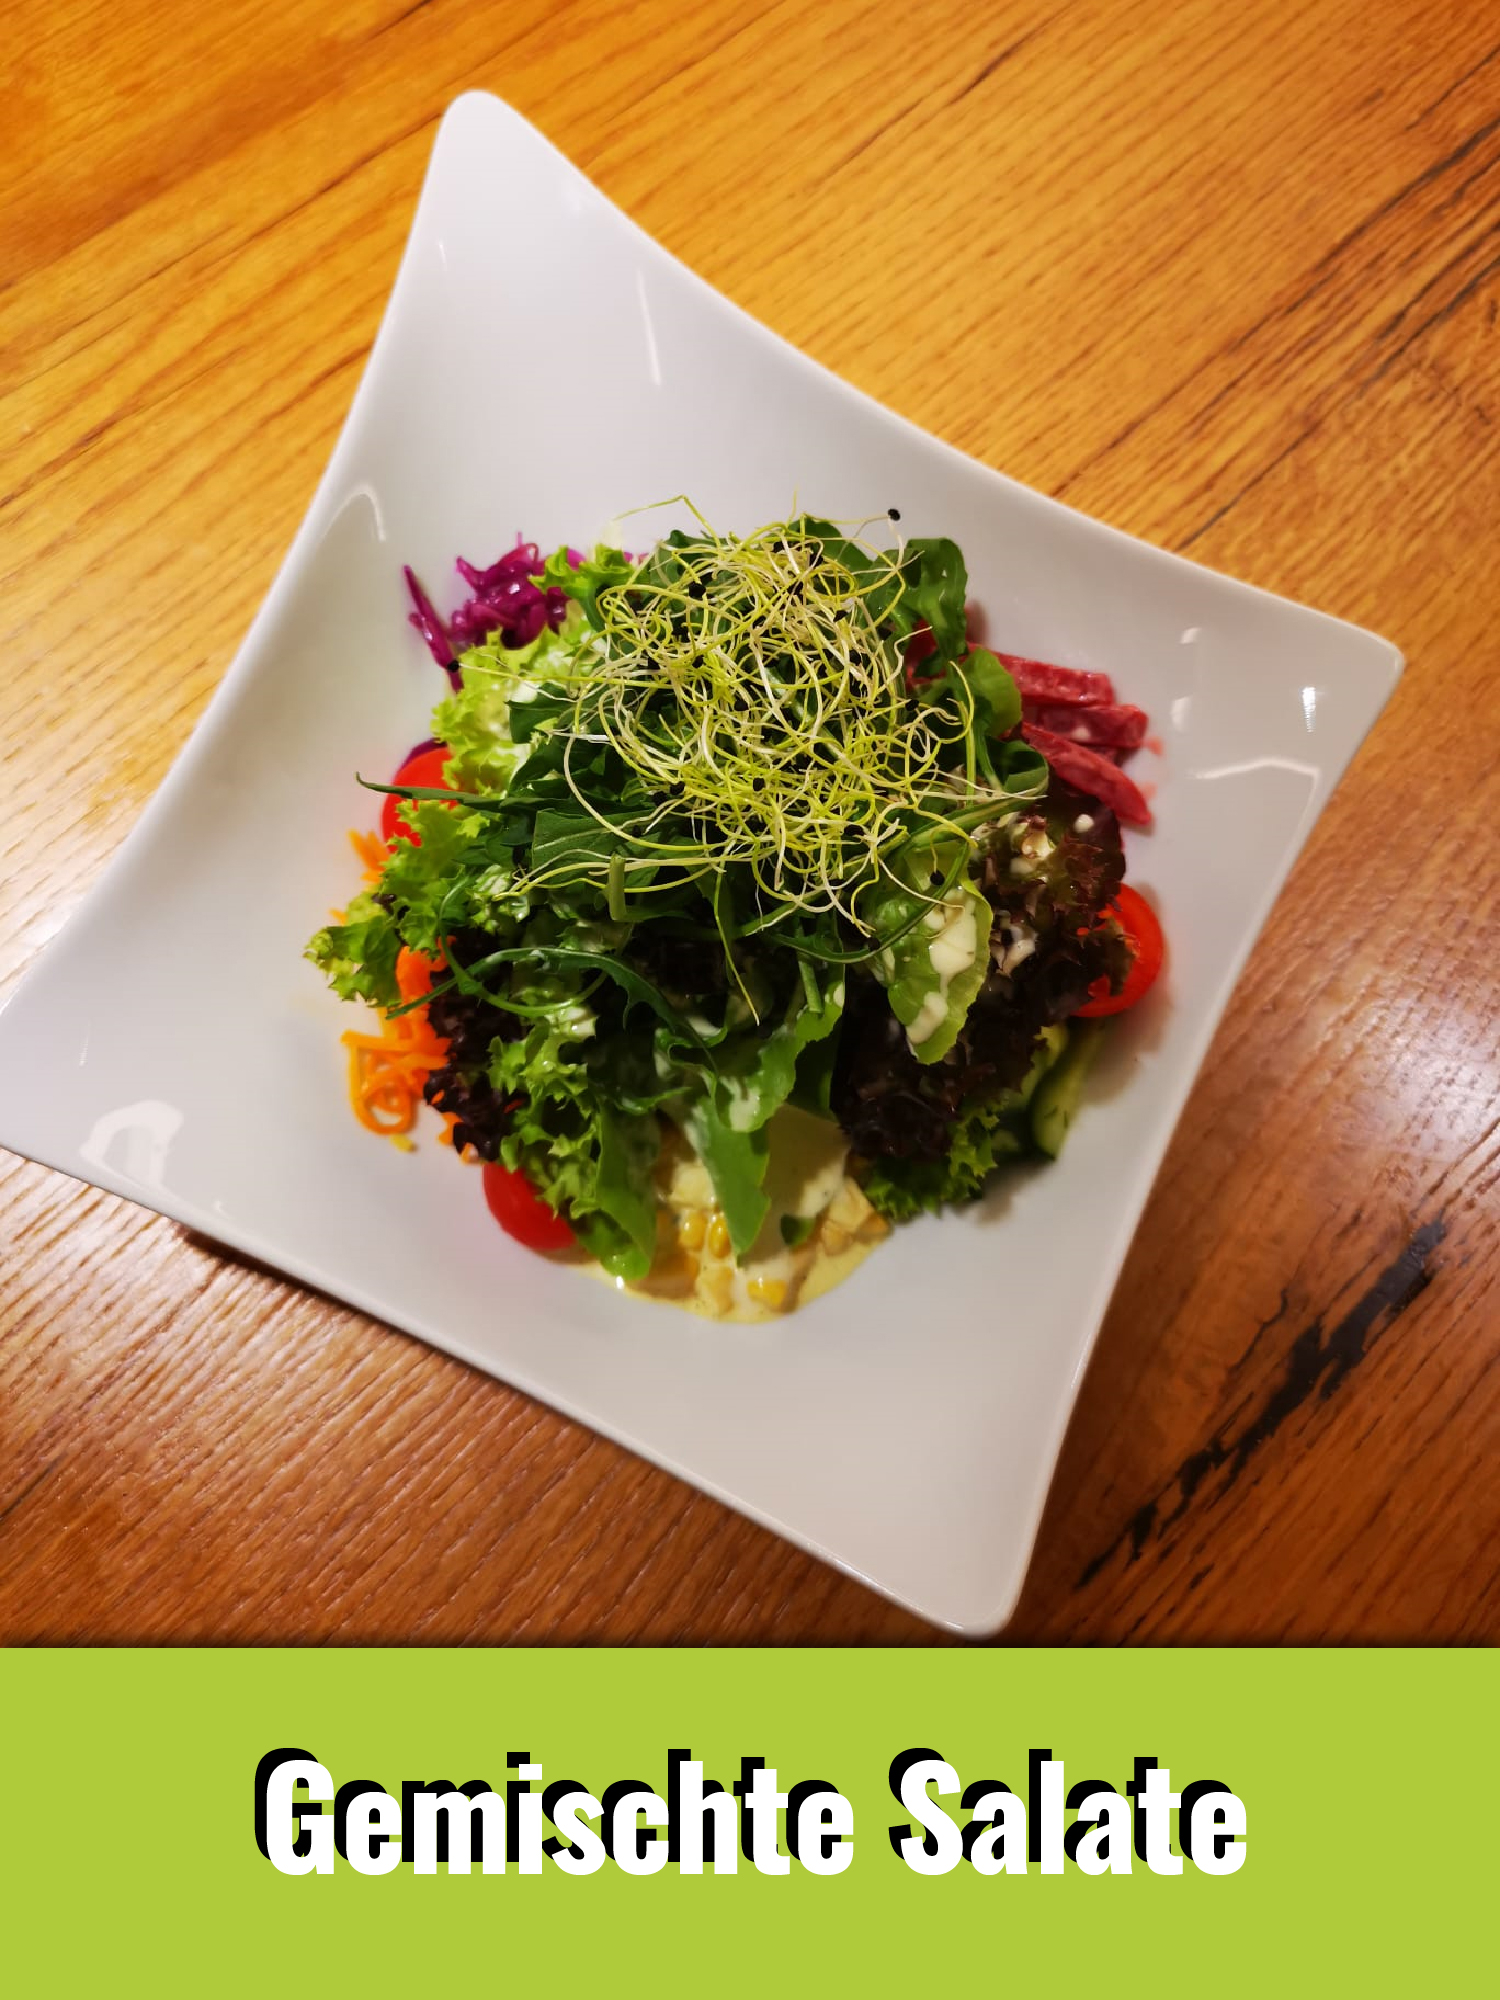 Edelweiss-Pizzeria-Restaurant-Gemischte-Salate